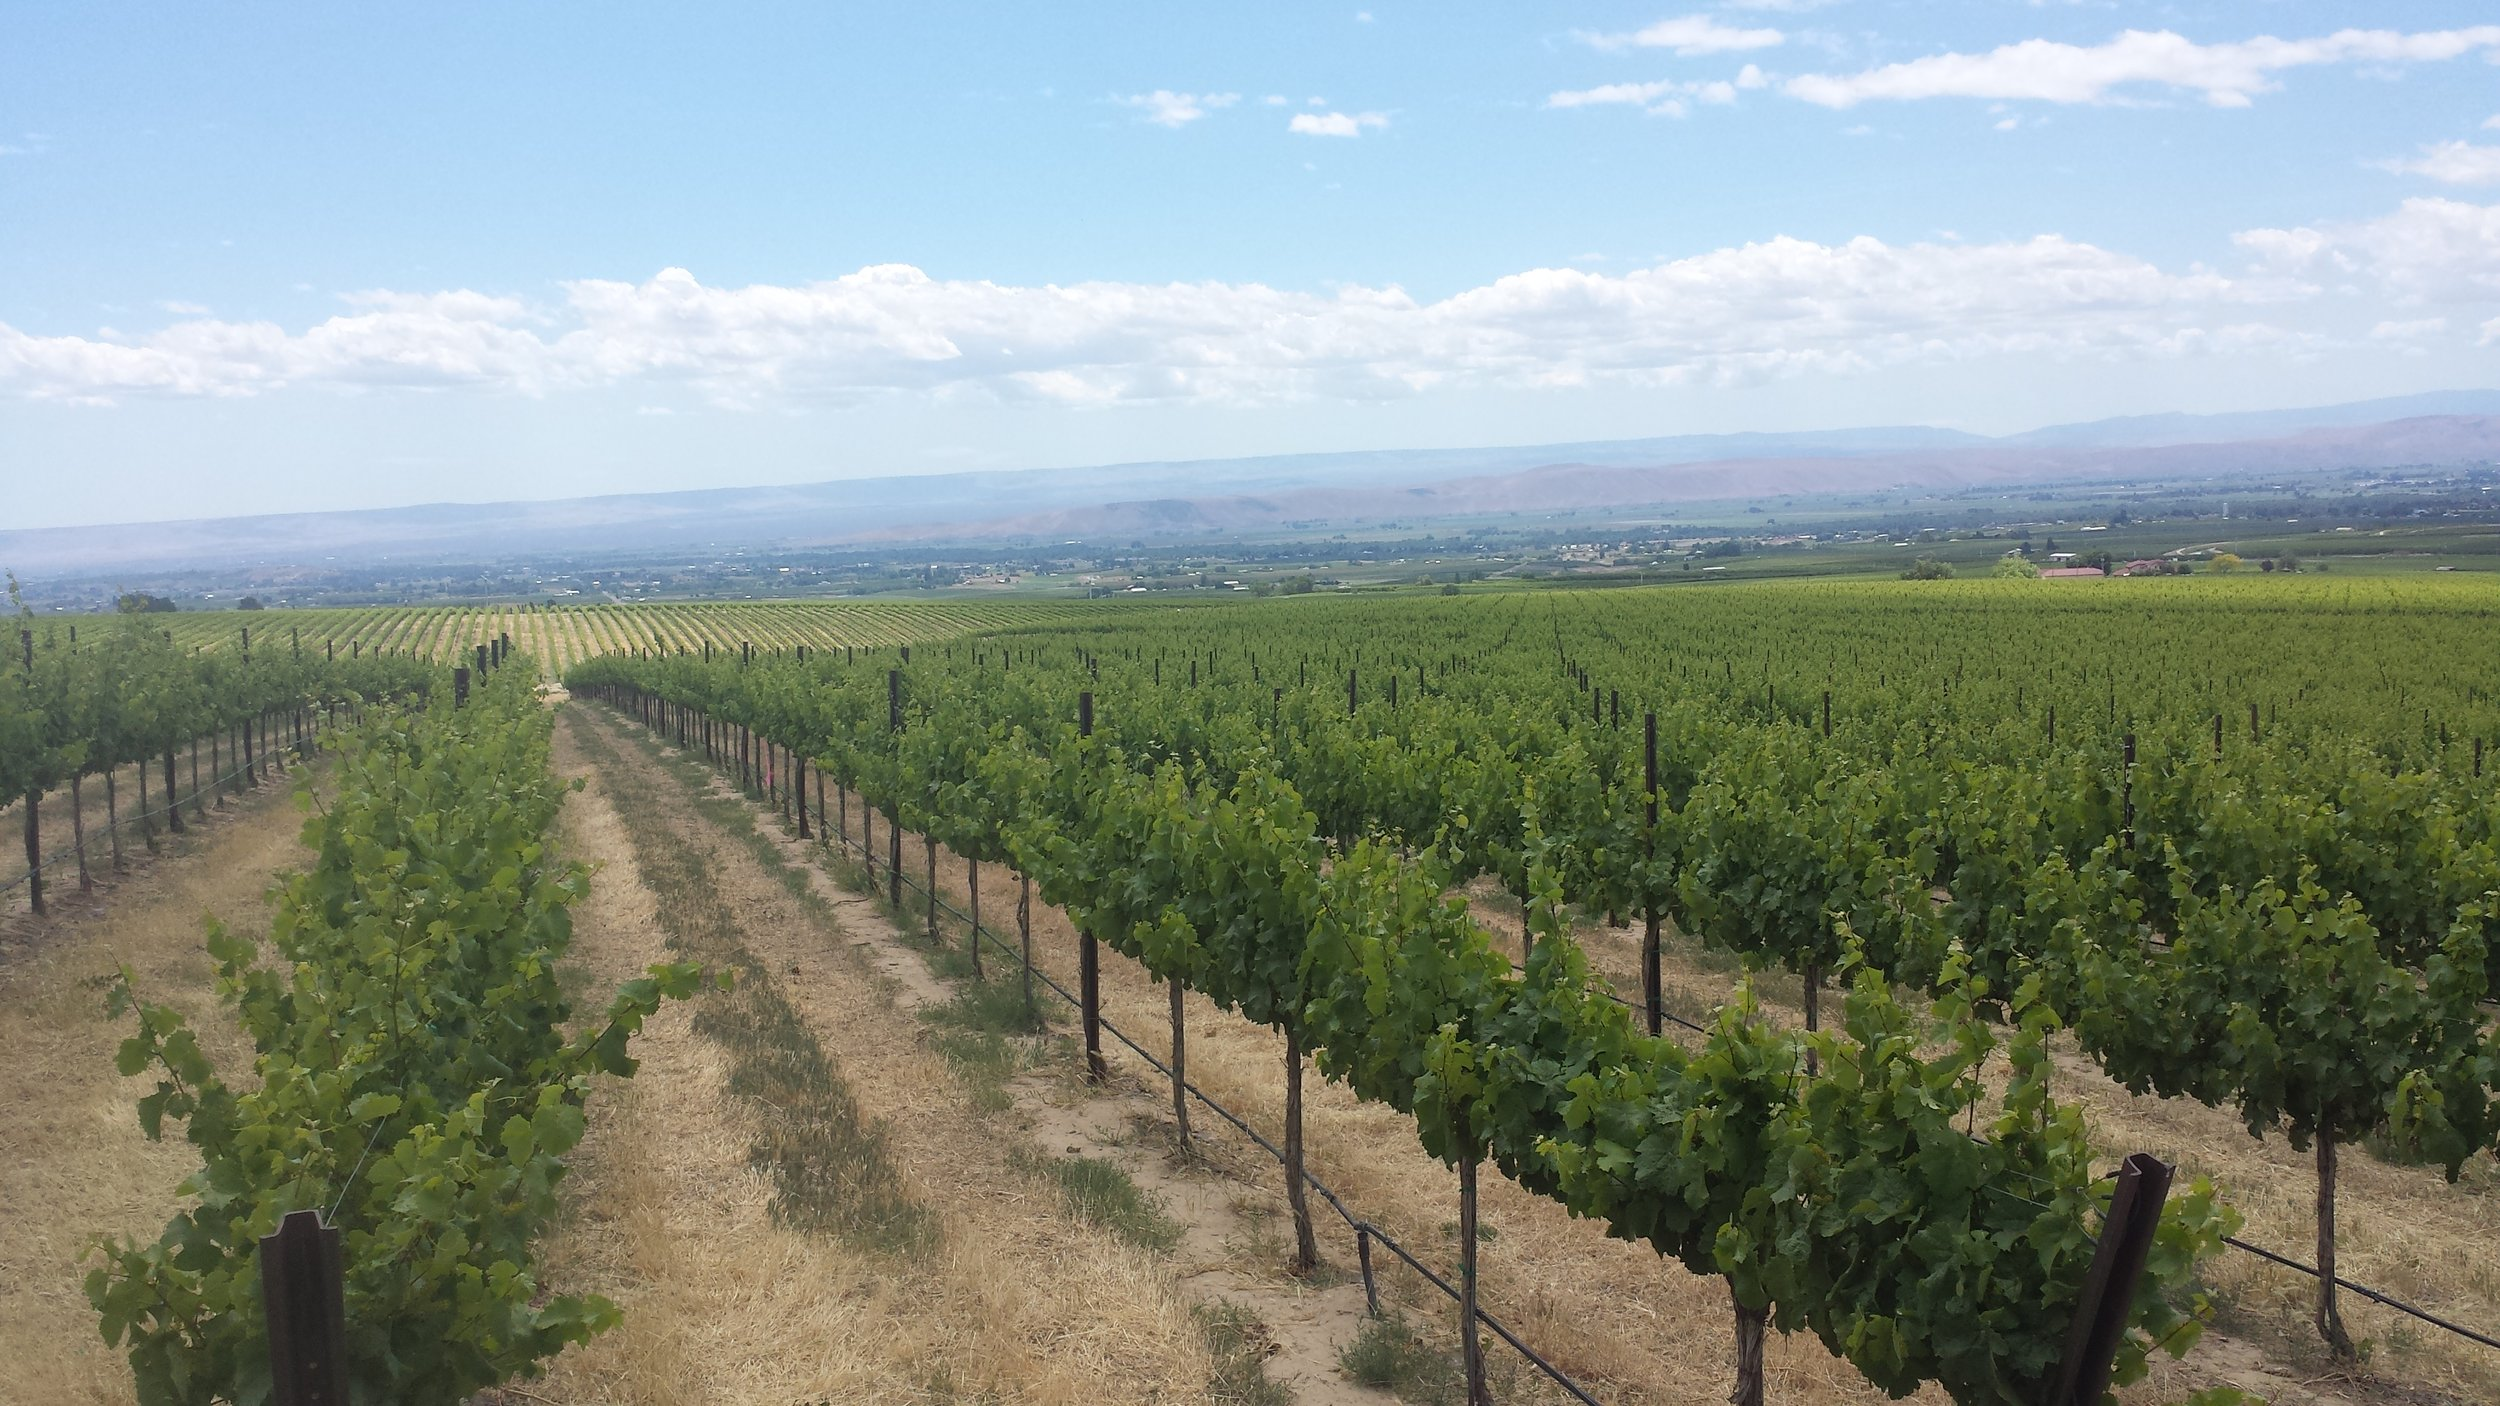 The Zillah Ranch Vineyard in the Columbia Valley, Washington.